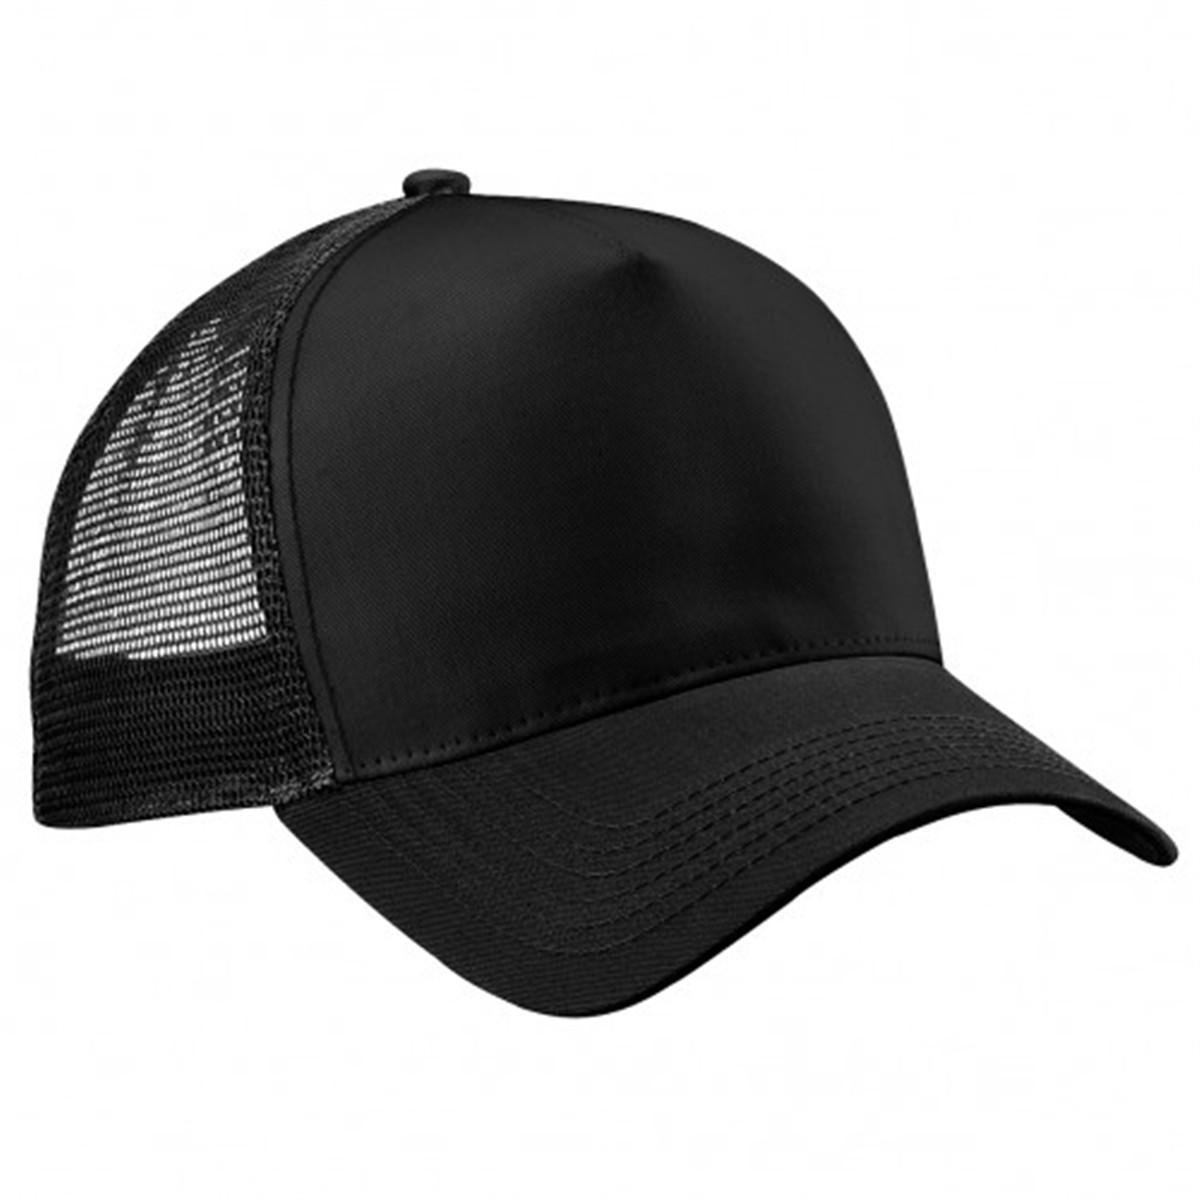 Hot Sale Unisex DIY Logo Baseball Caps Fashion Design Classic Trucker Adjustable Hip-hop Couples Hats 12 Colors For Choice(China (Mainland))